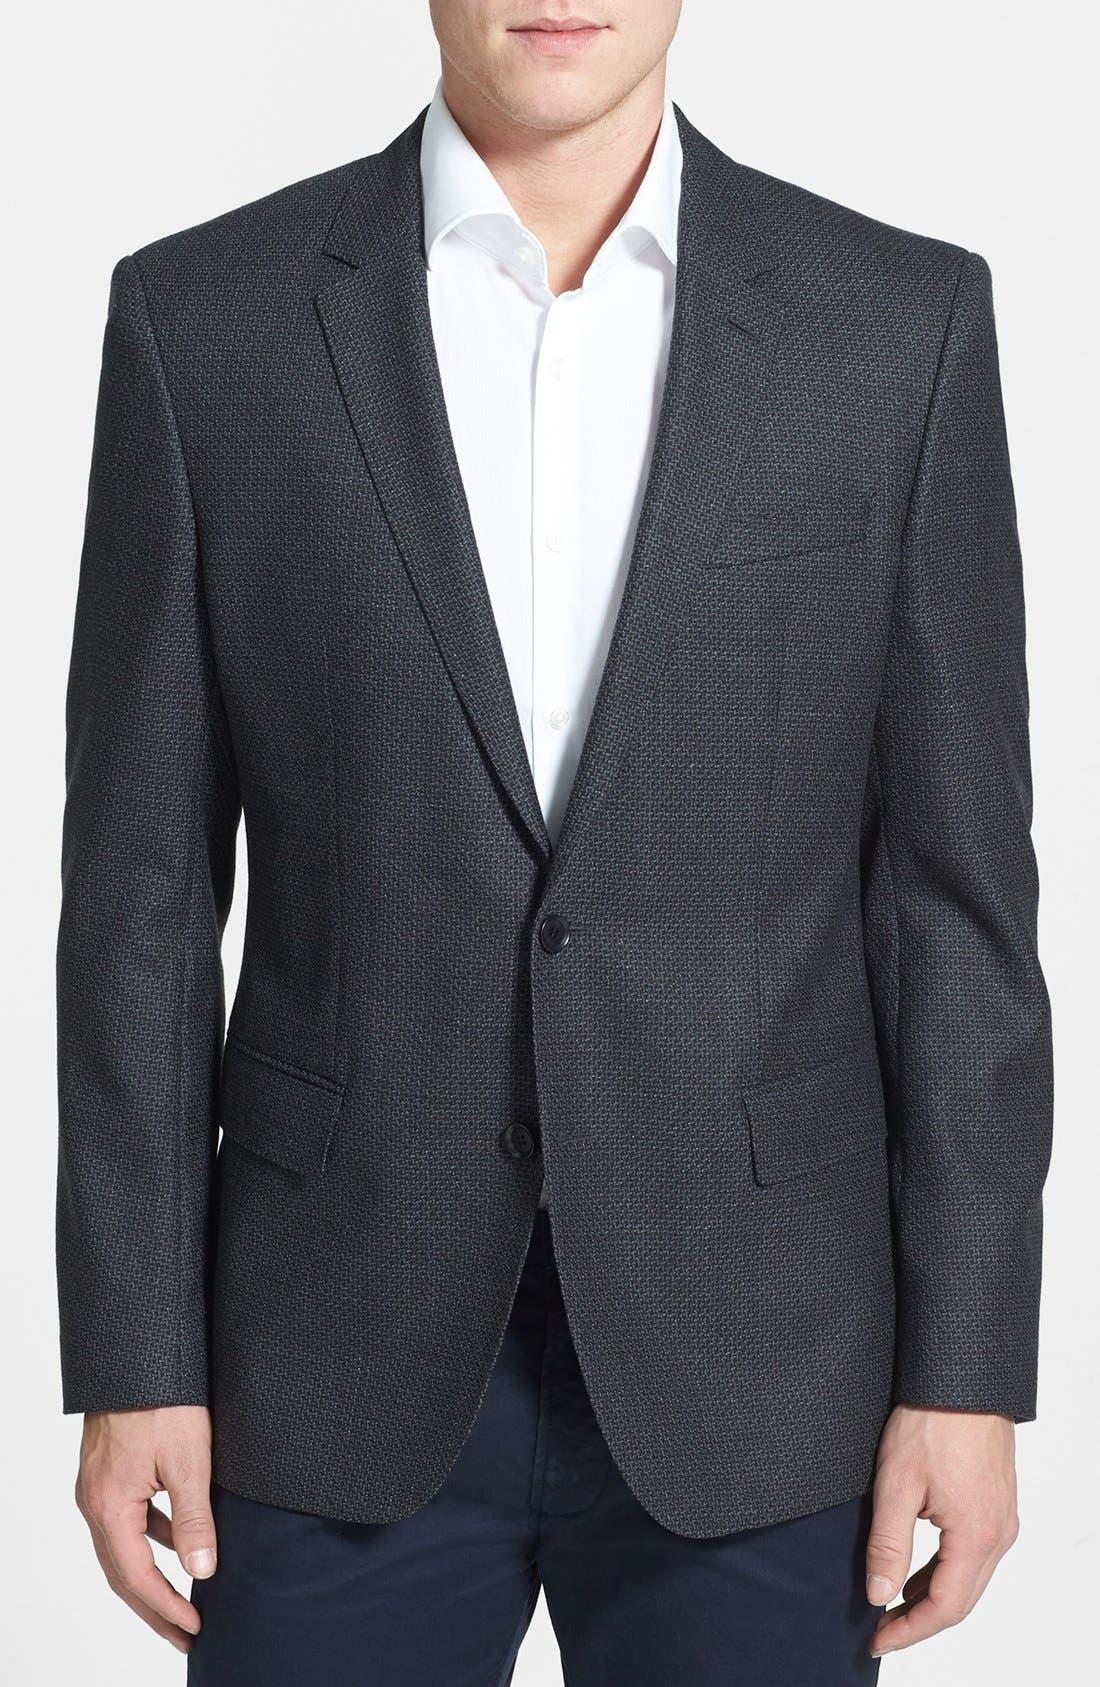 Main Image - BOSS HUGO BOSS 'Hutch' Trim Fit Wool Sportcoat